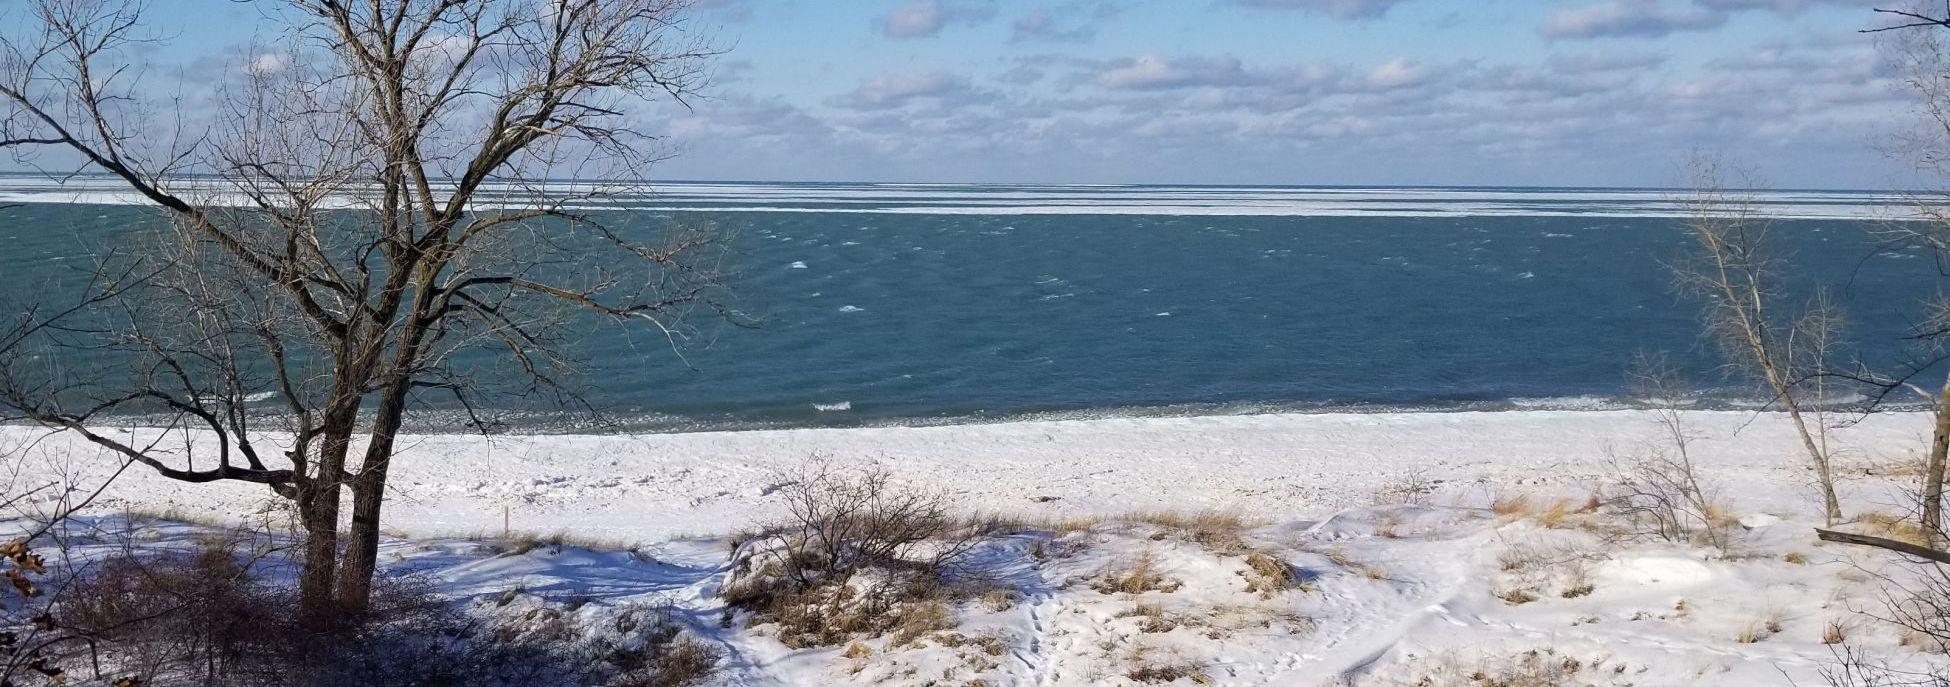 Porter Beach in Winter